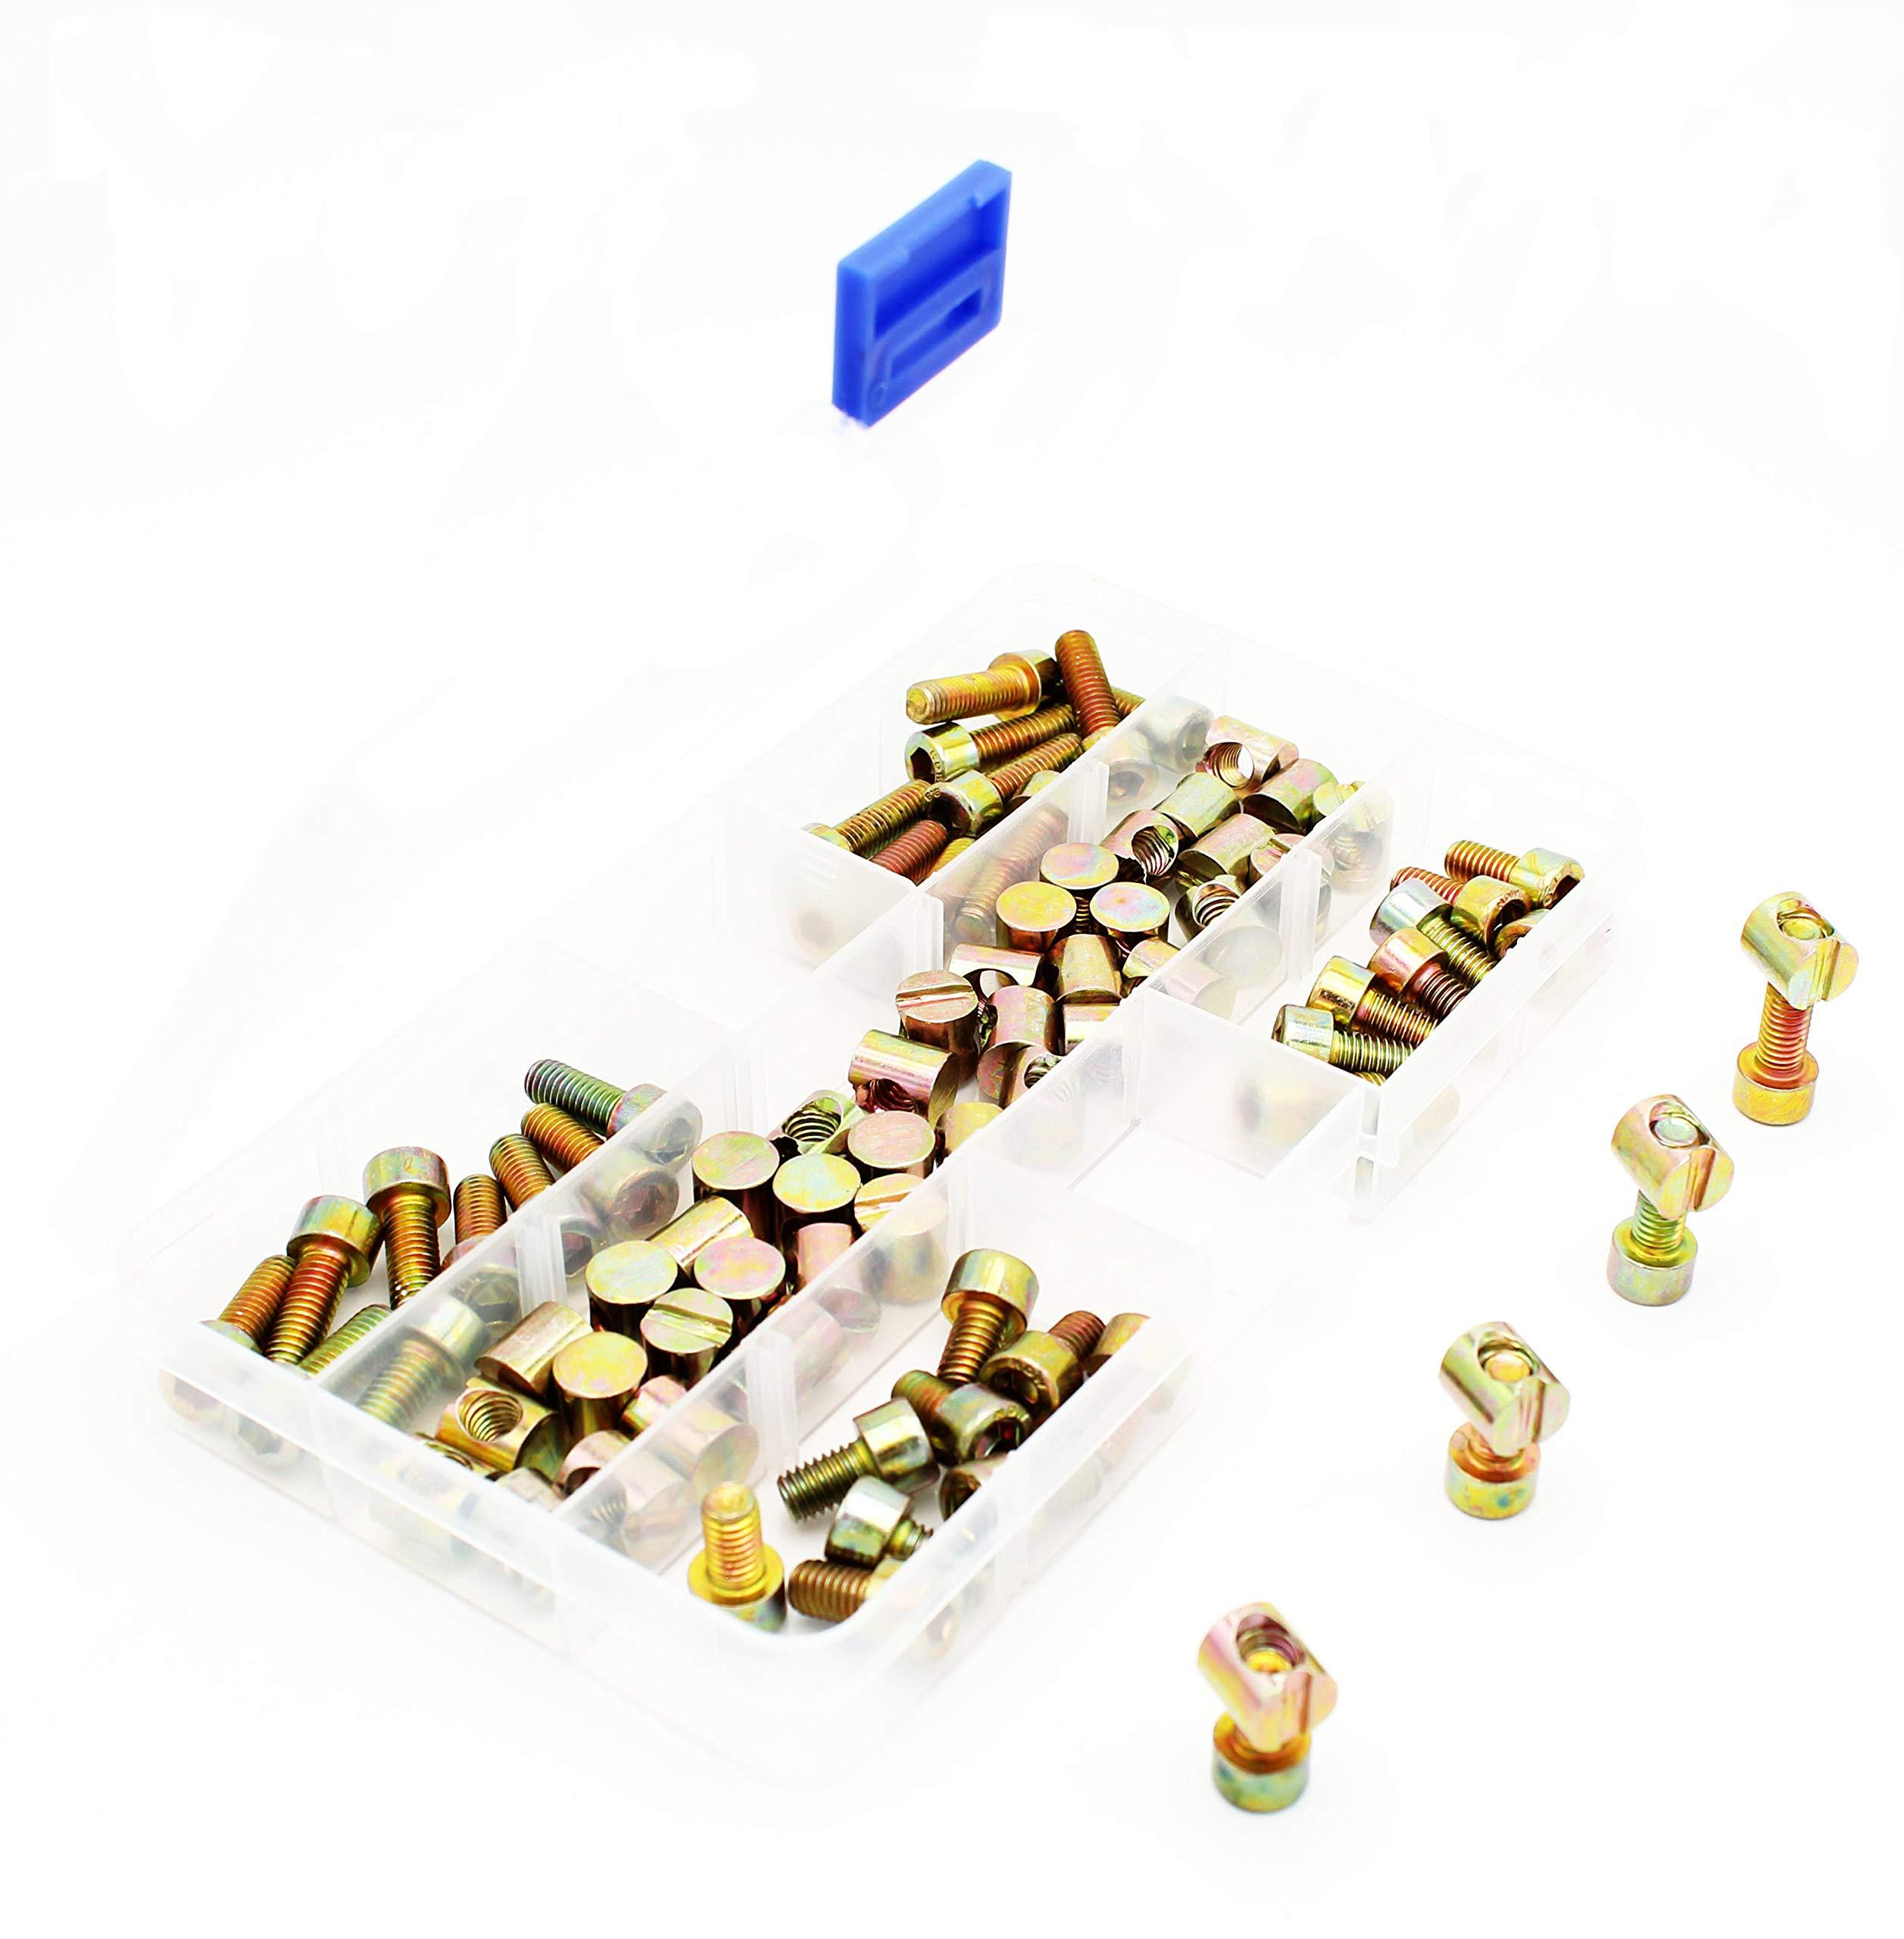 Smartsails (100Pcs) M6 Furniture Bucket Nut Bolt Classification Kit, Crib Hardware Parts,Hexagonal Sleeve M6 x10mm / 12mm /16mm / 20mm Crib Bolt Sleeve Nut 50 Sets